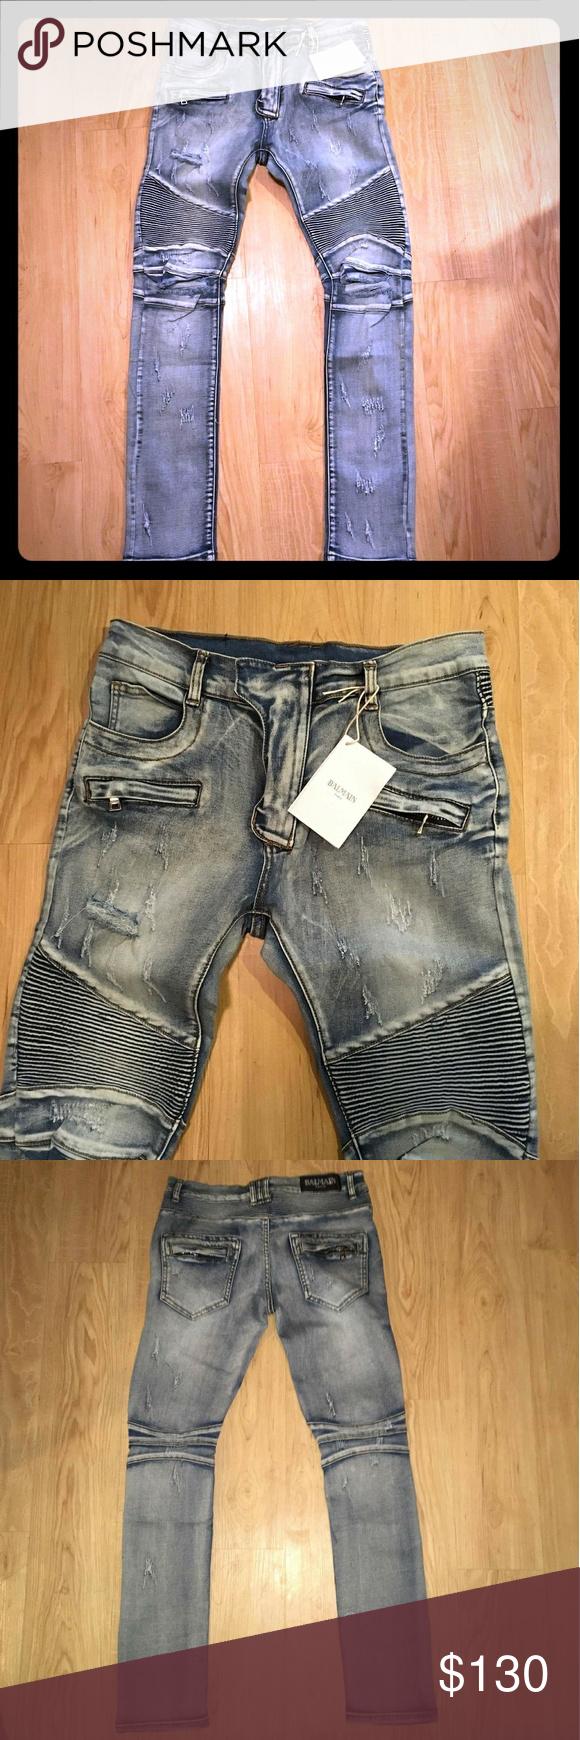 99a2ef6d Balmain biker jeans size 32 New Size 32 stretch Fast 2-3 days shipping  Balmain Jeans Slim Straight